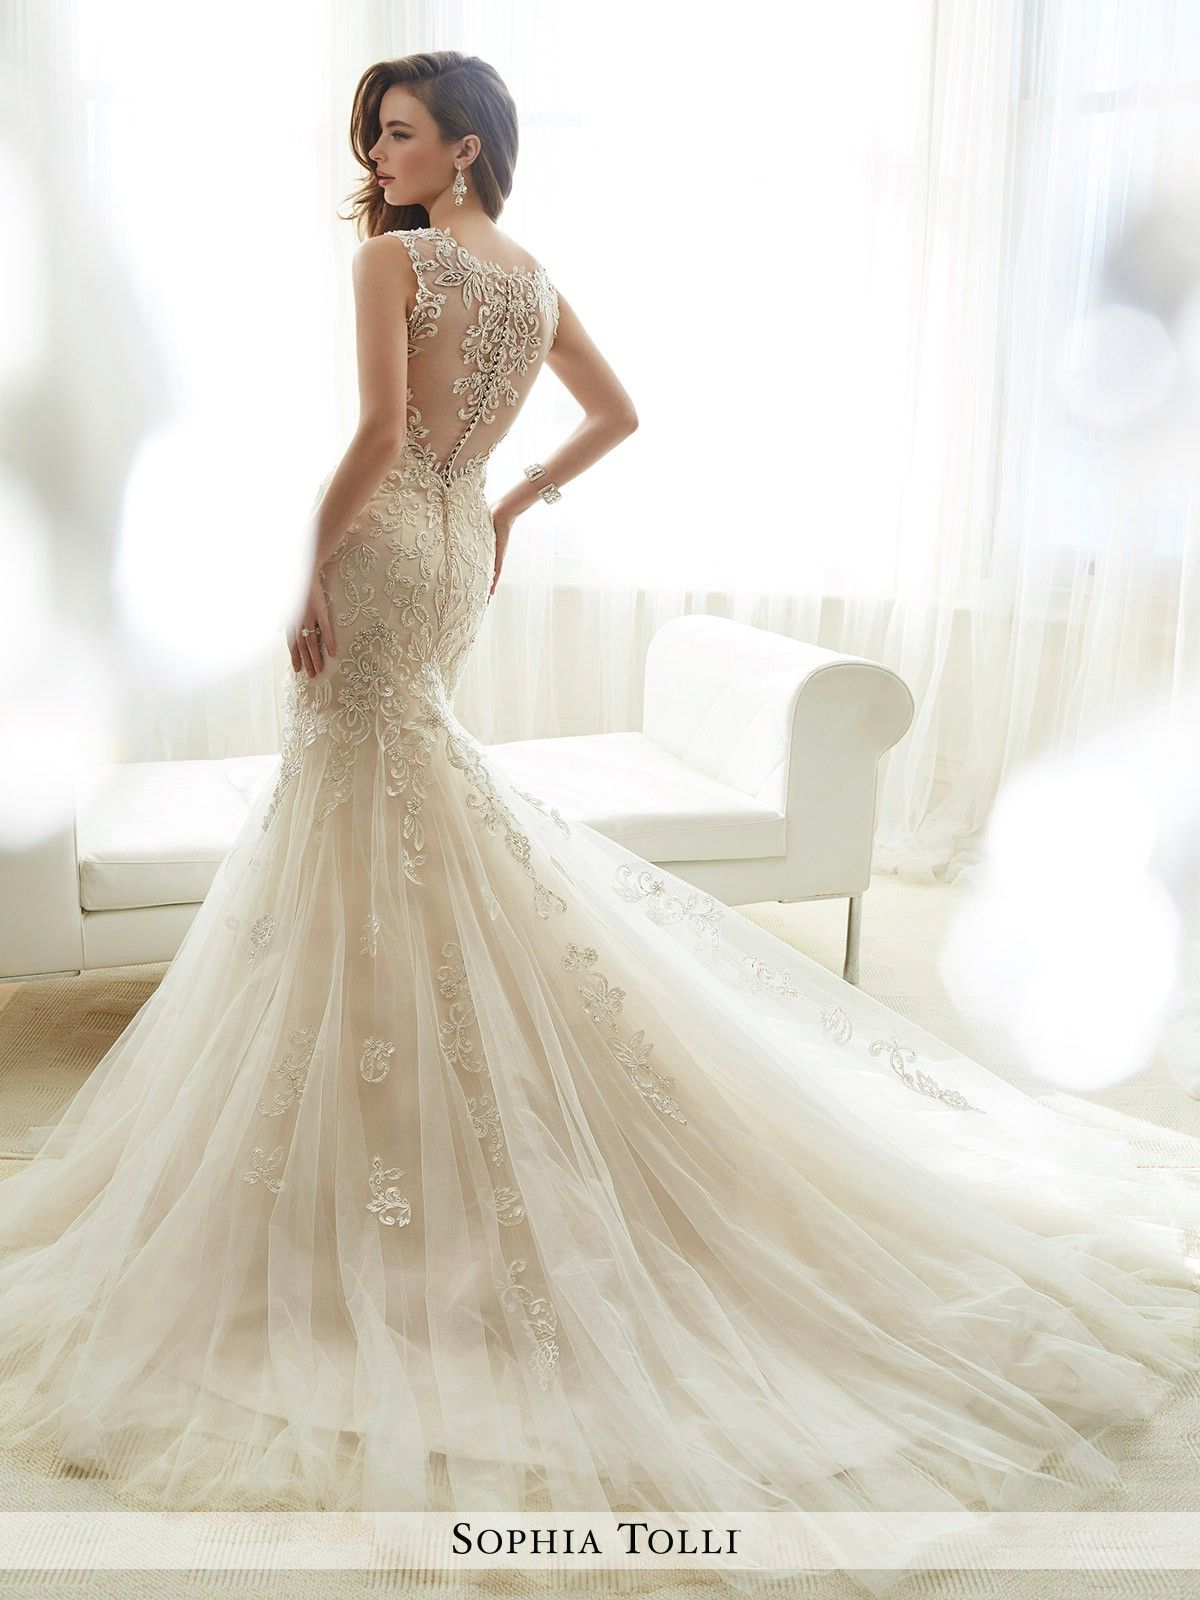 Sophia Tolli Wedding Dresses - Style Amie   Wedding gowns   Pinterest